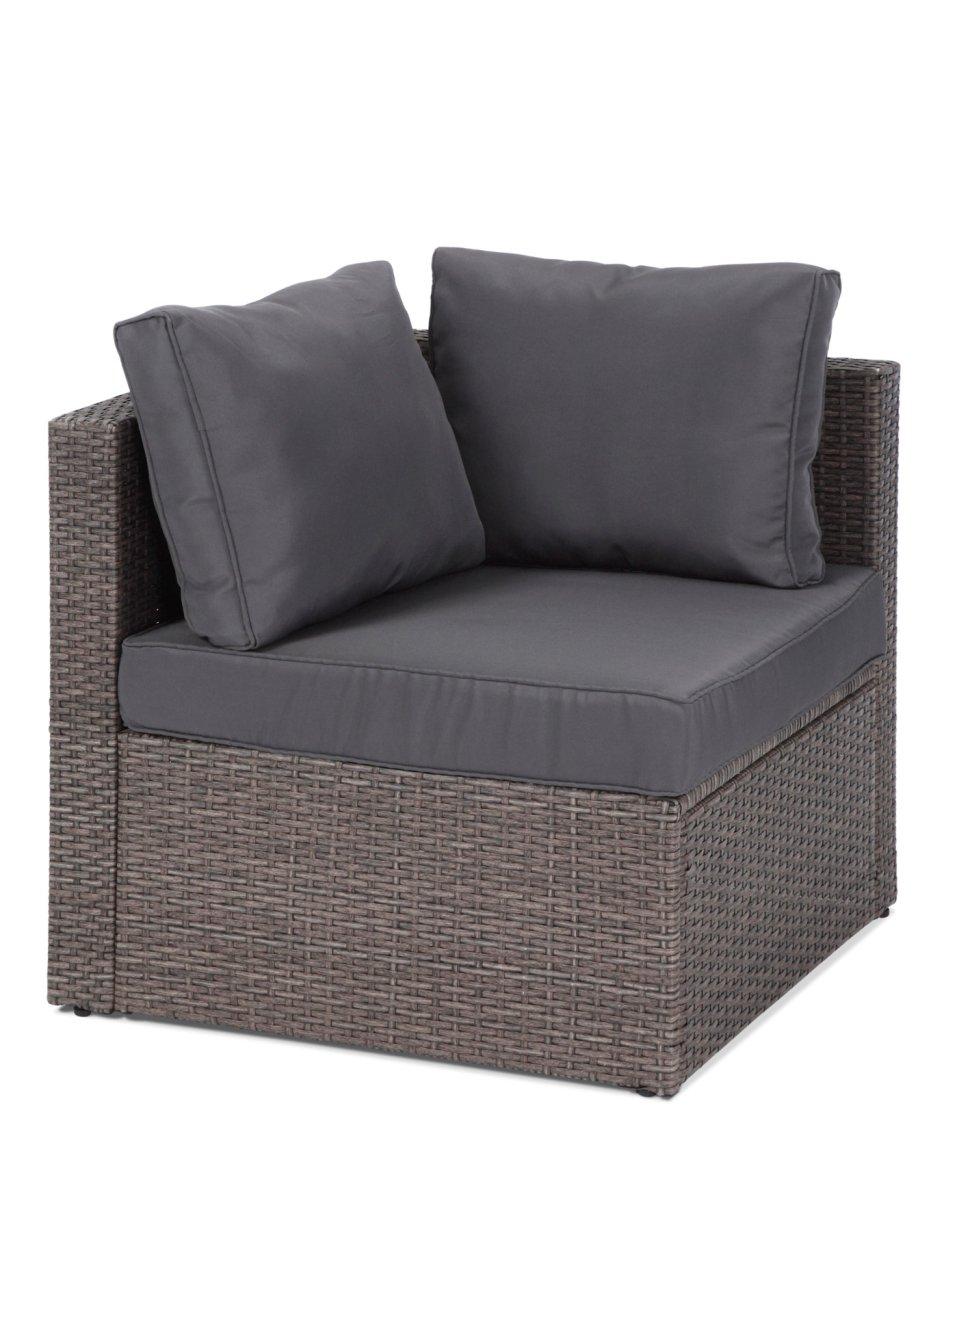 eckelement boracay natur wohnen. Black Bedroom Furniture Sets. Home Design Ideas